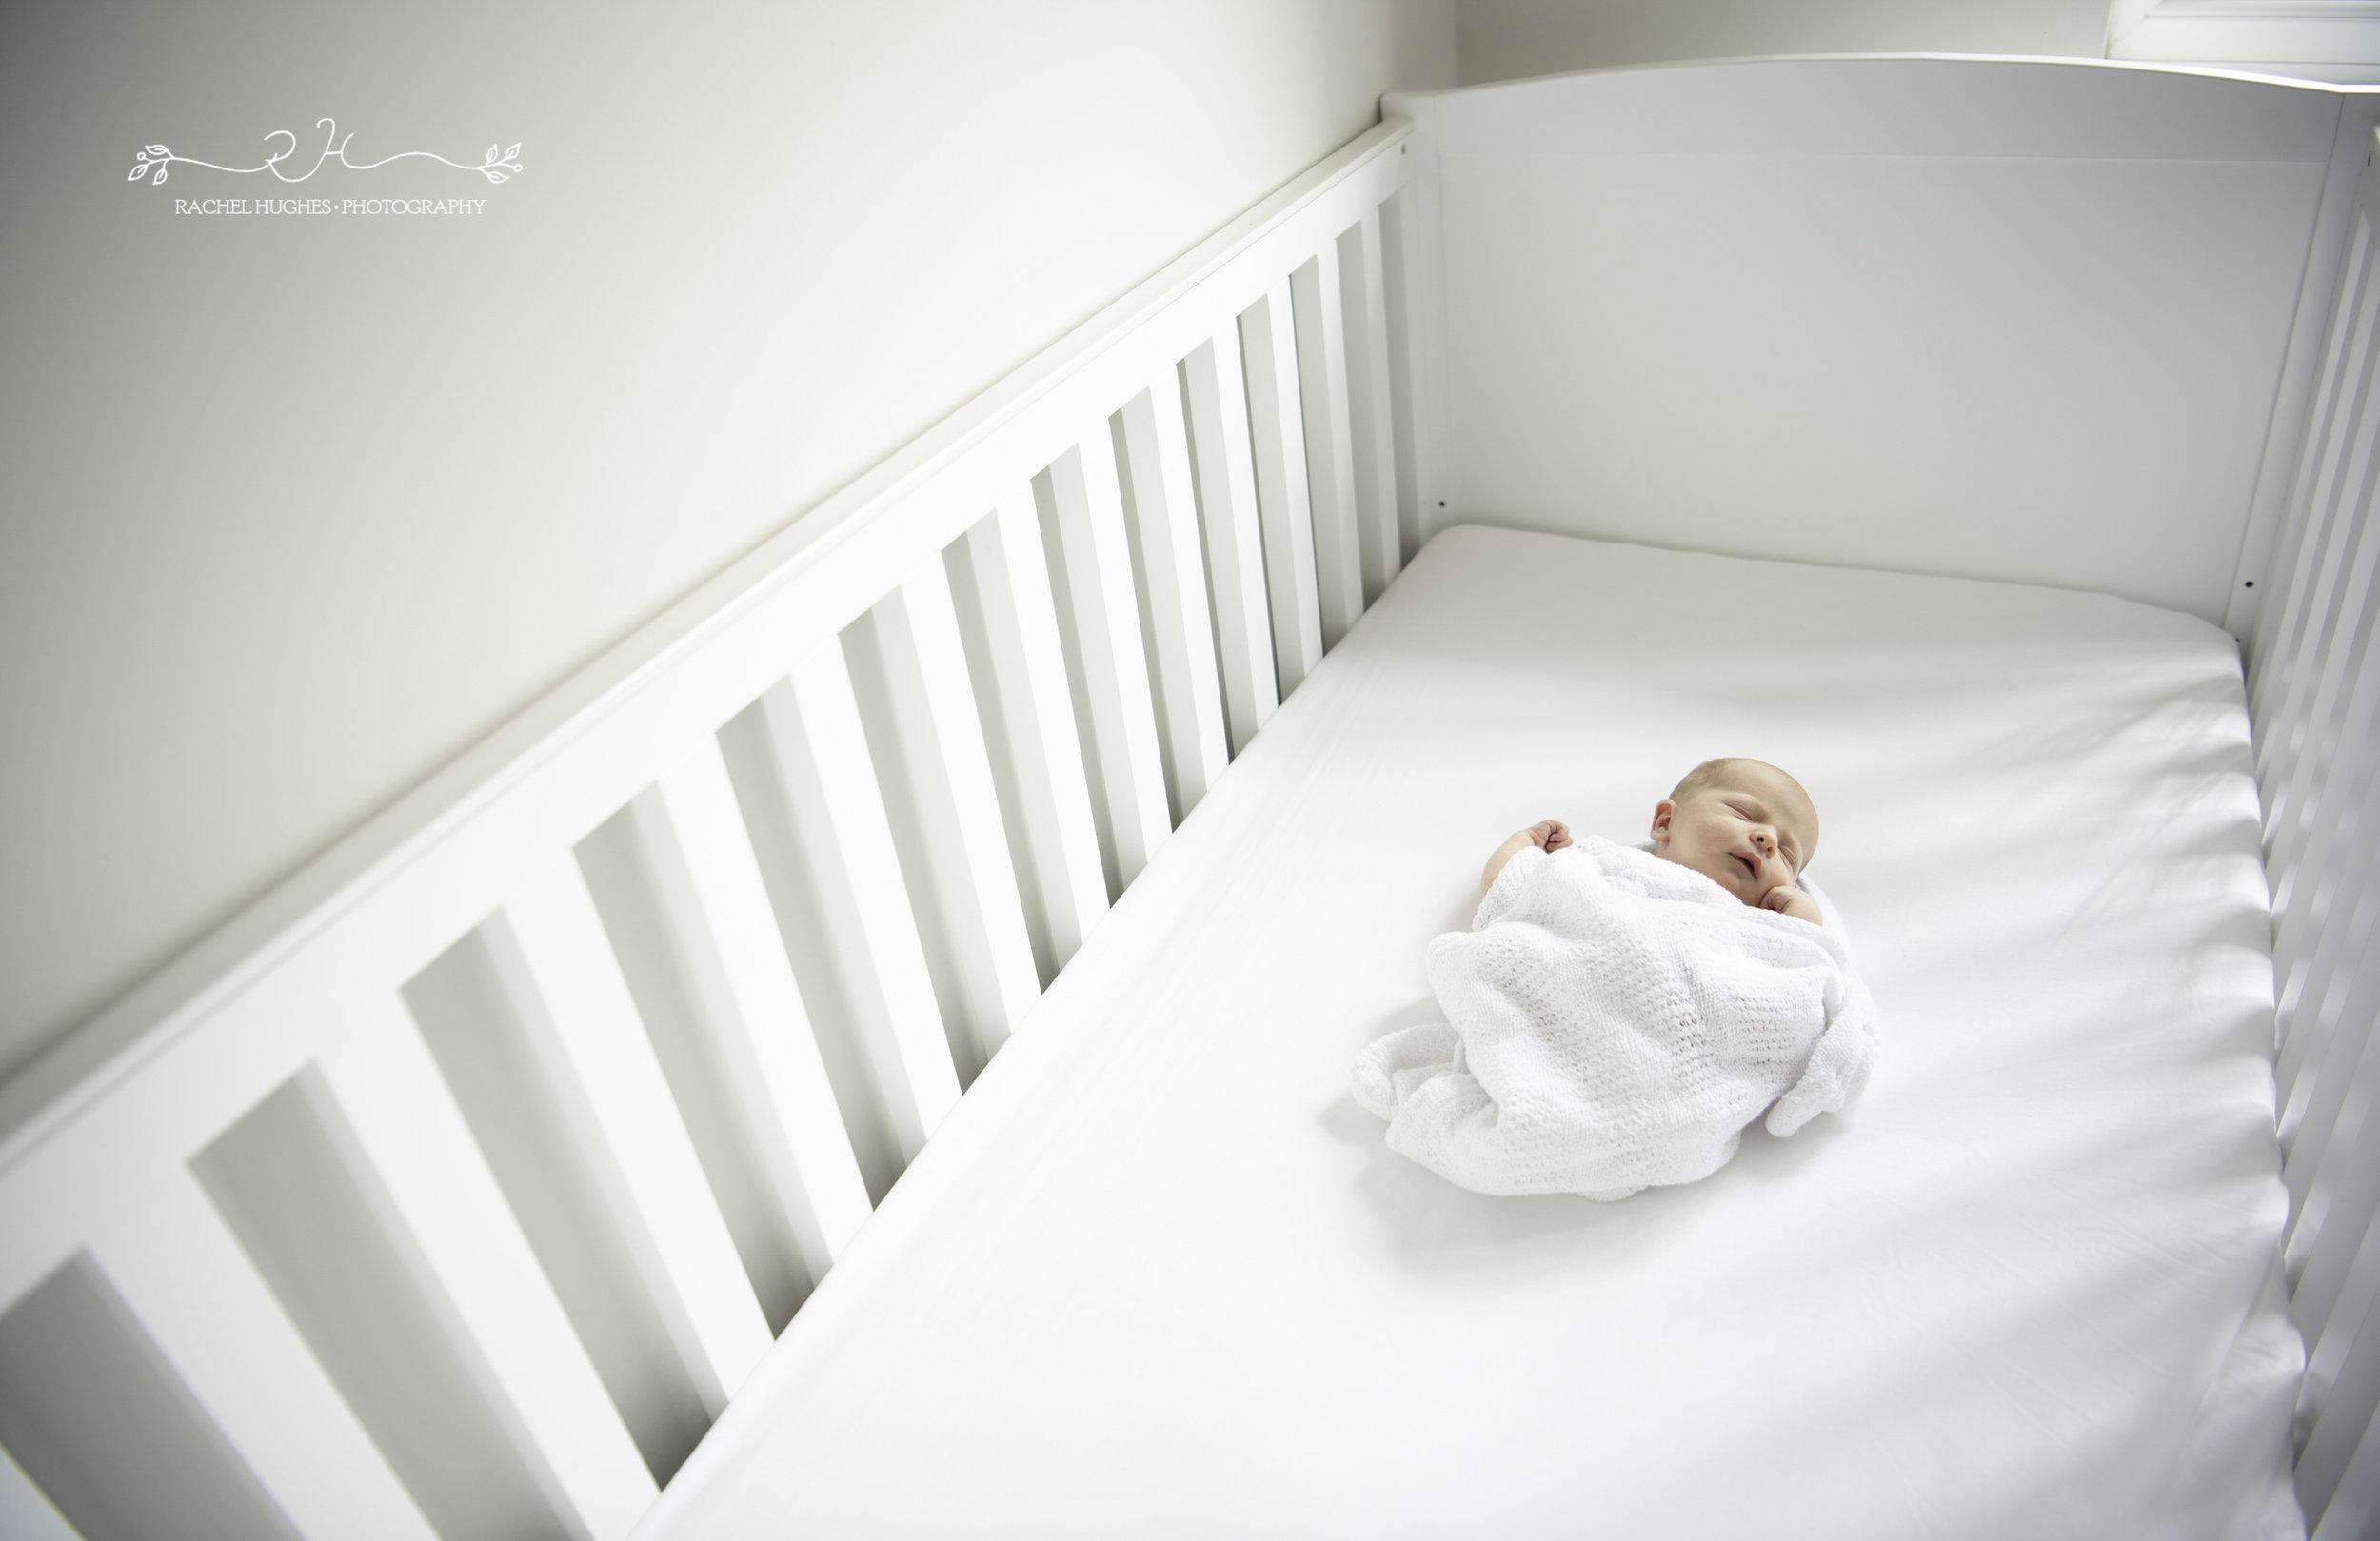 Jersey photographer - tiny newborn in cot